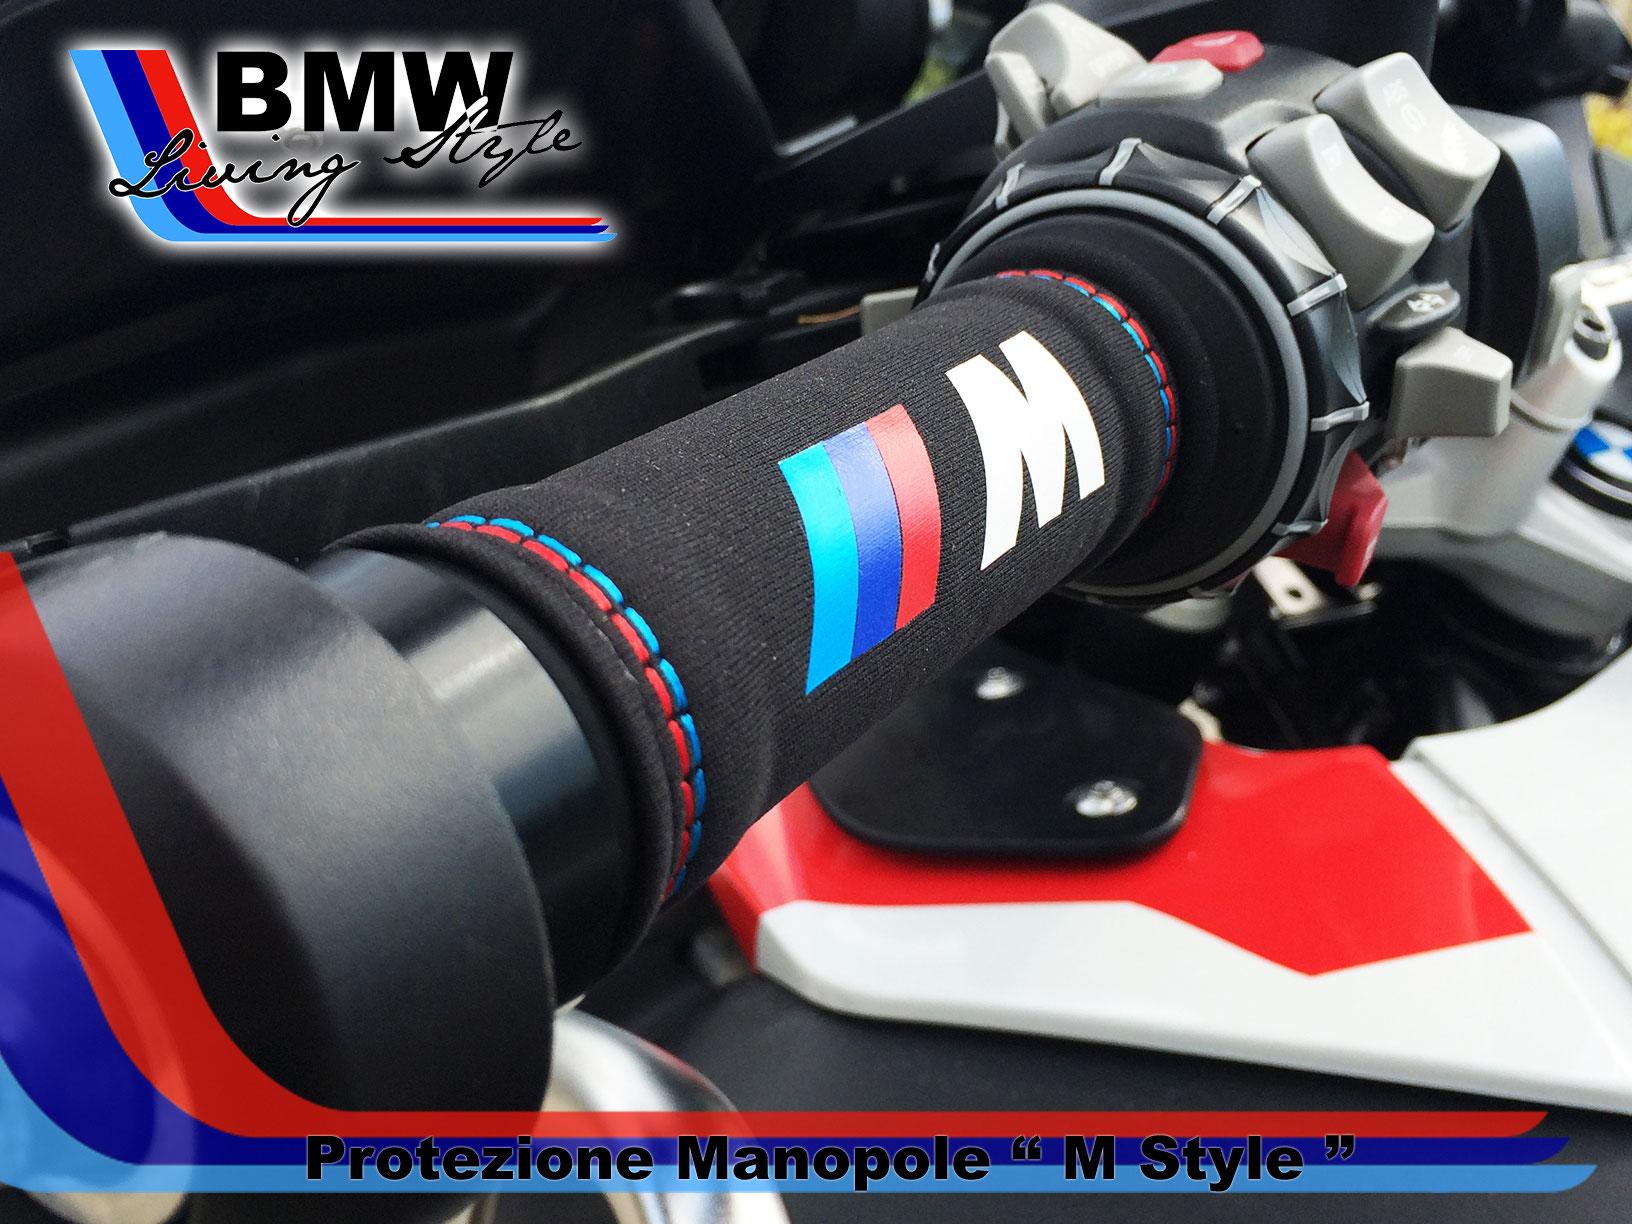 www.bmwlivingstyle.com